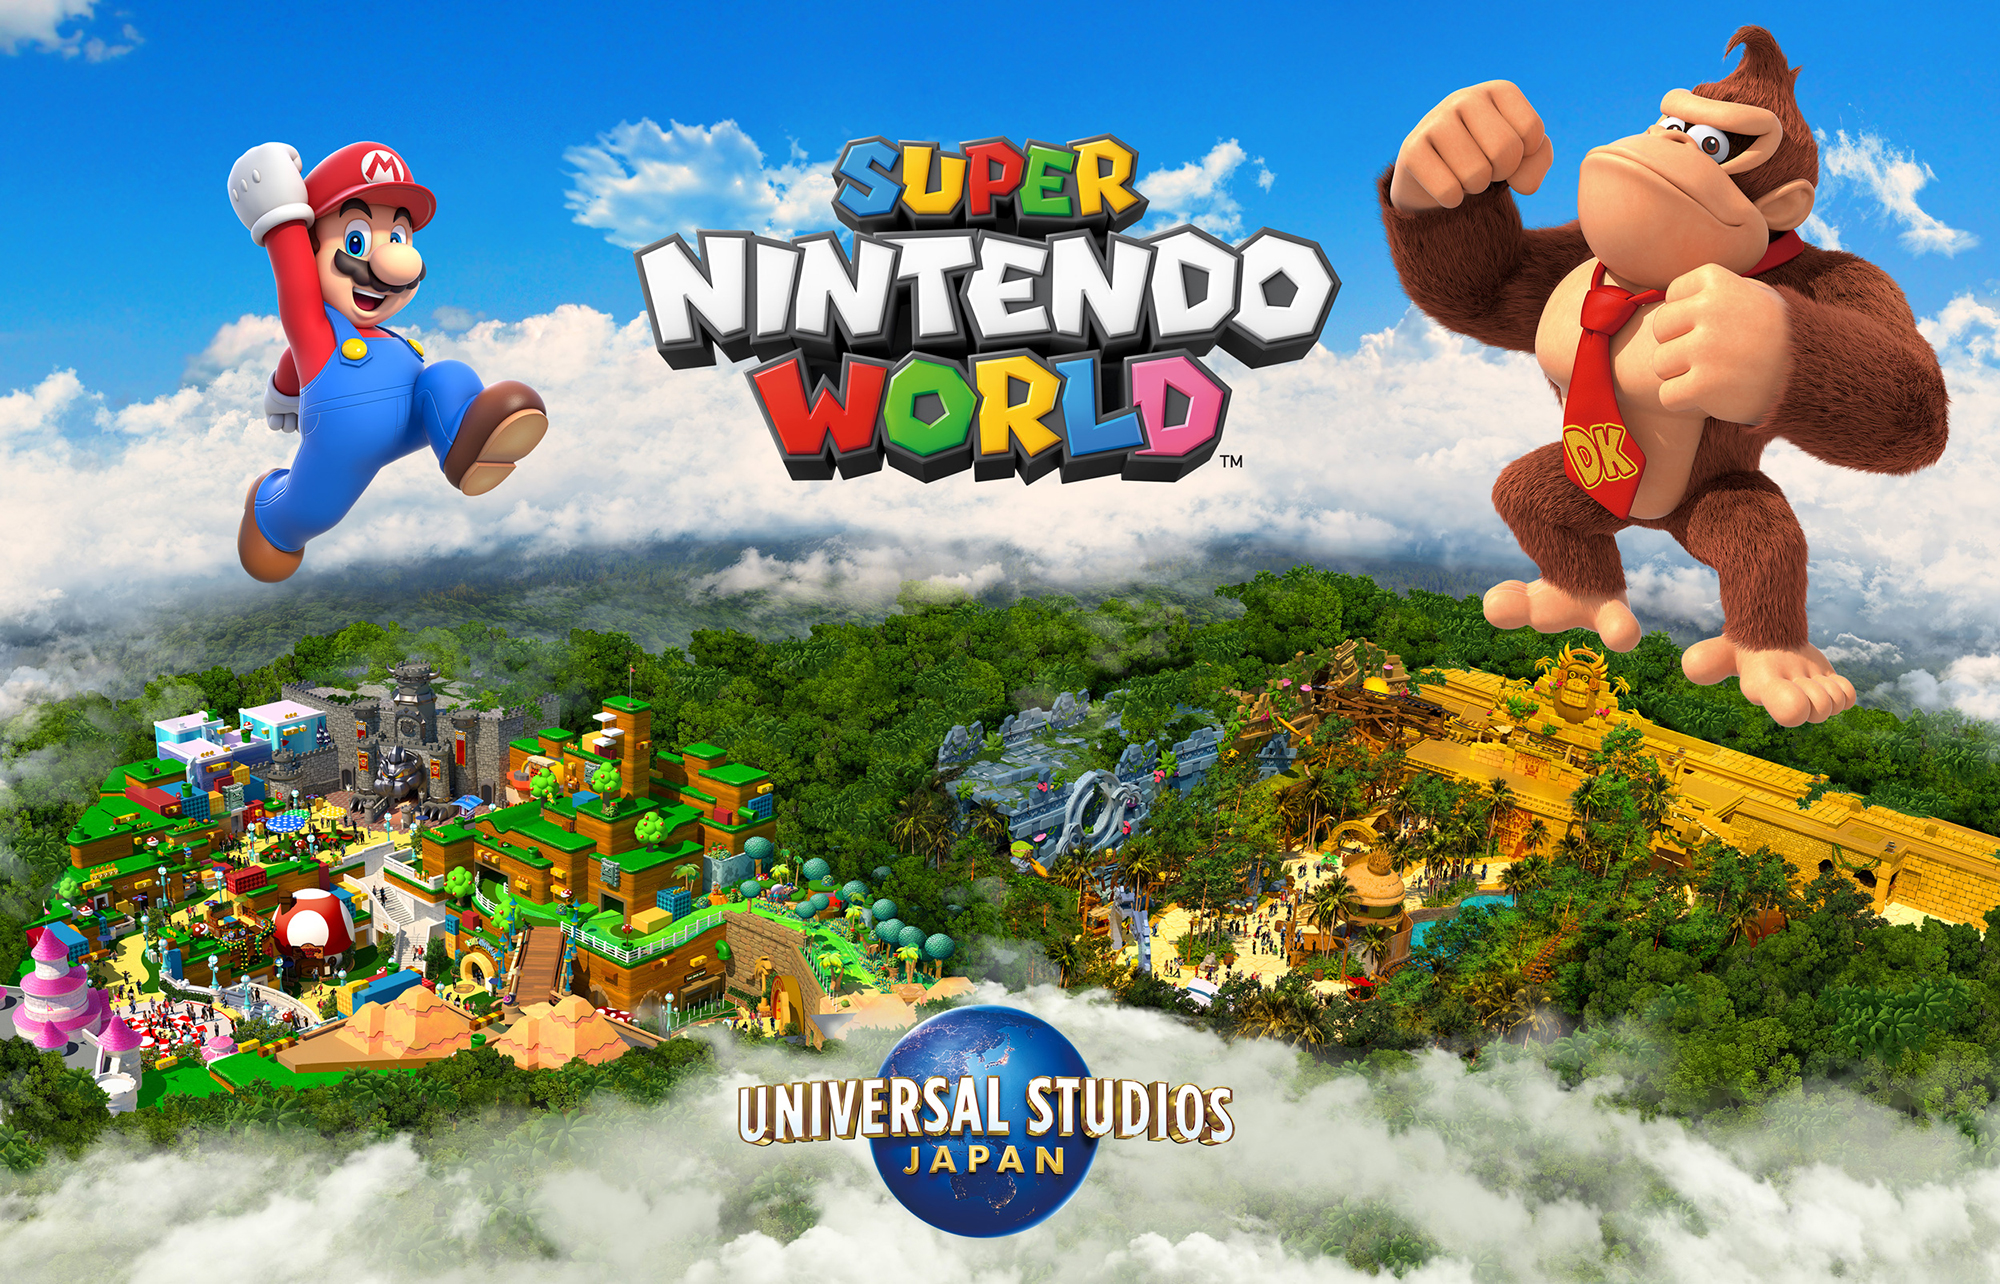 Donkey Kong - Super Nintendo World